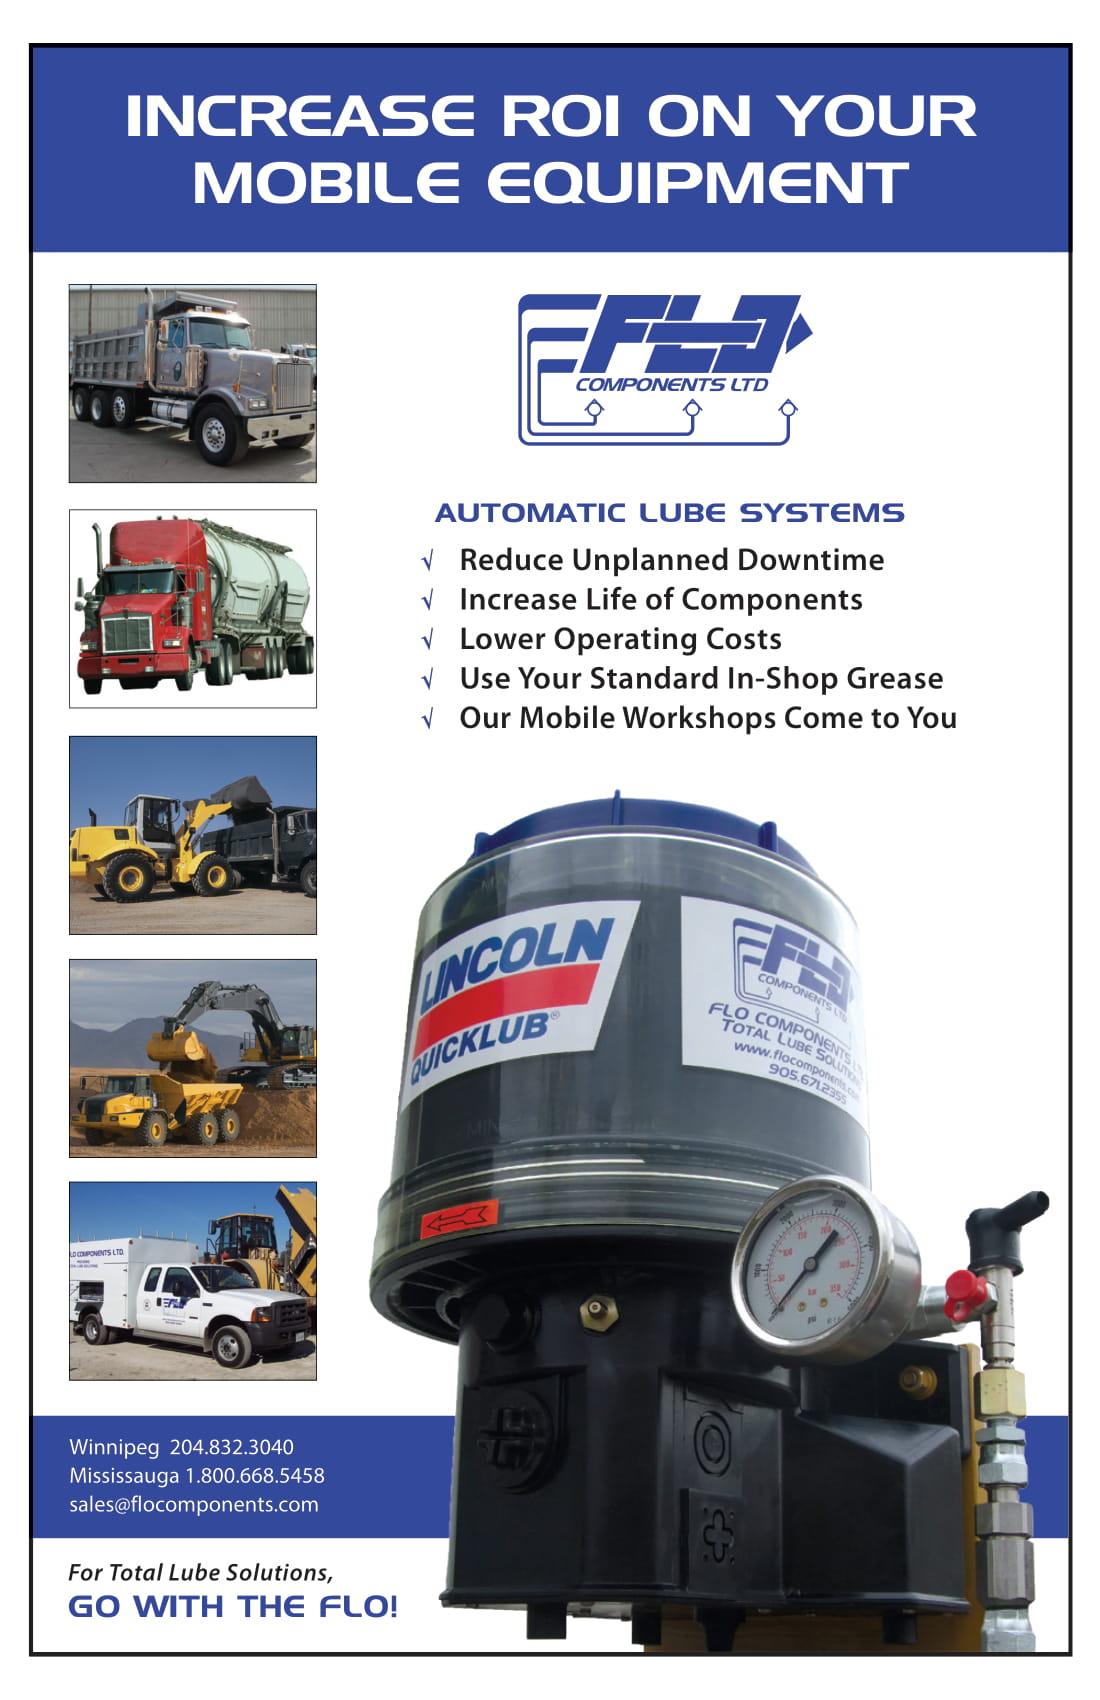 Flo Components Ltd